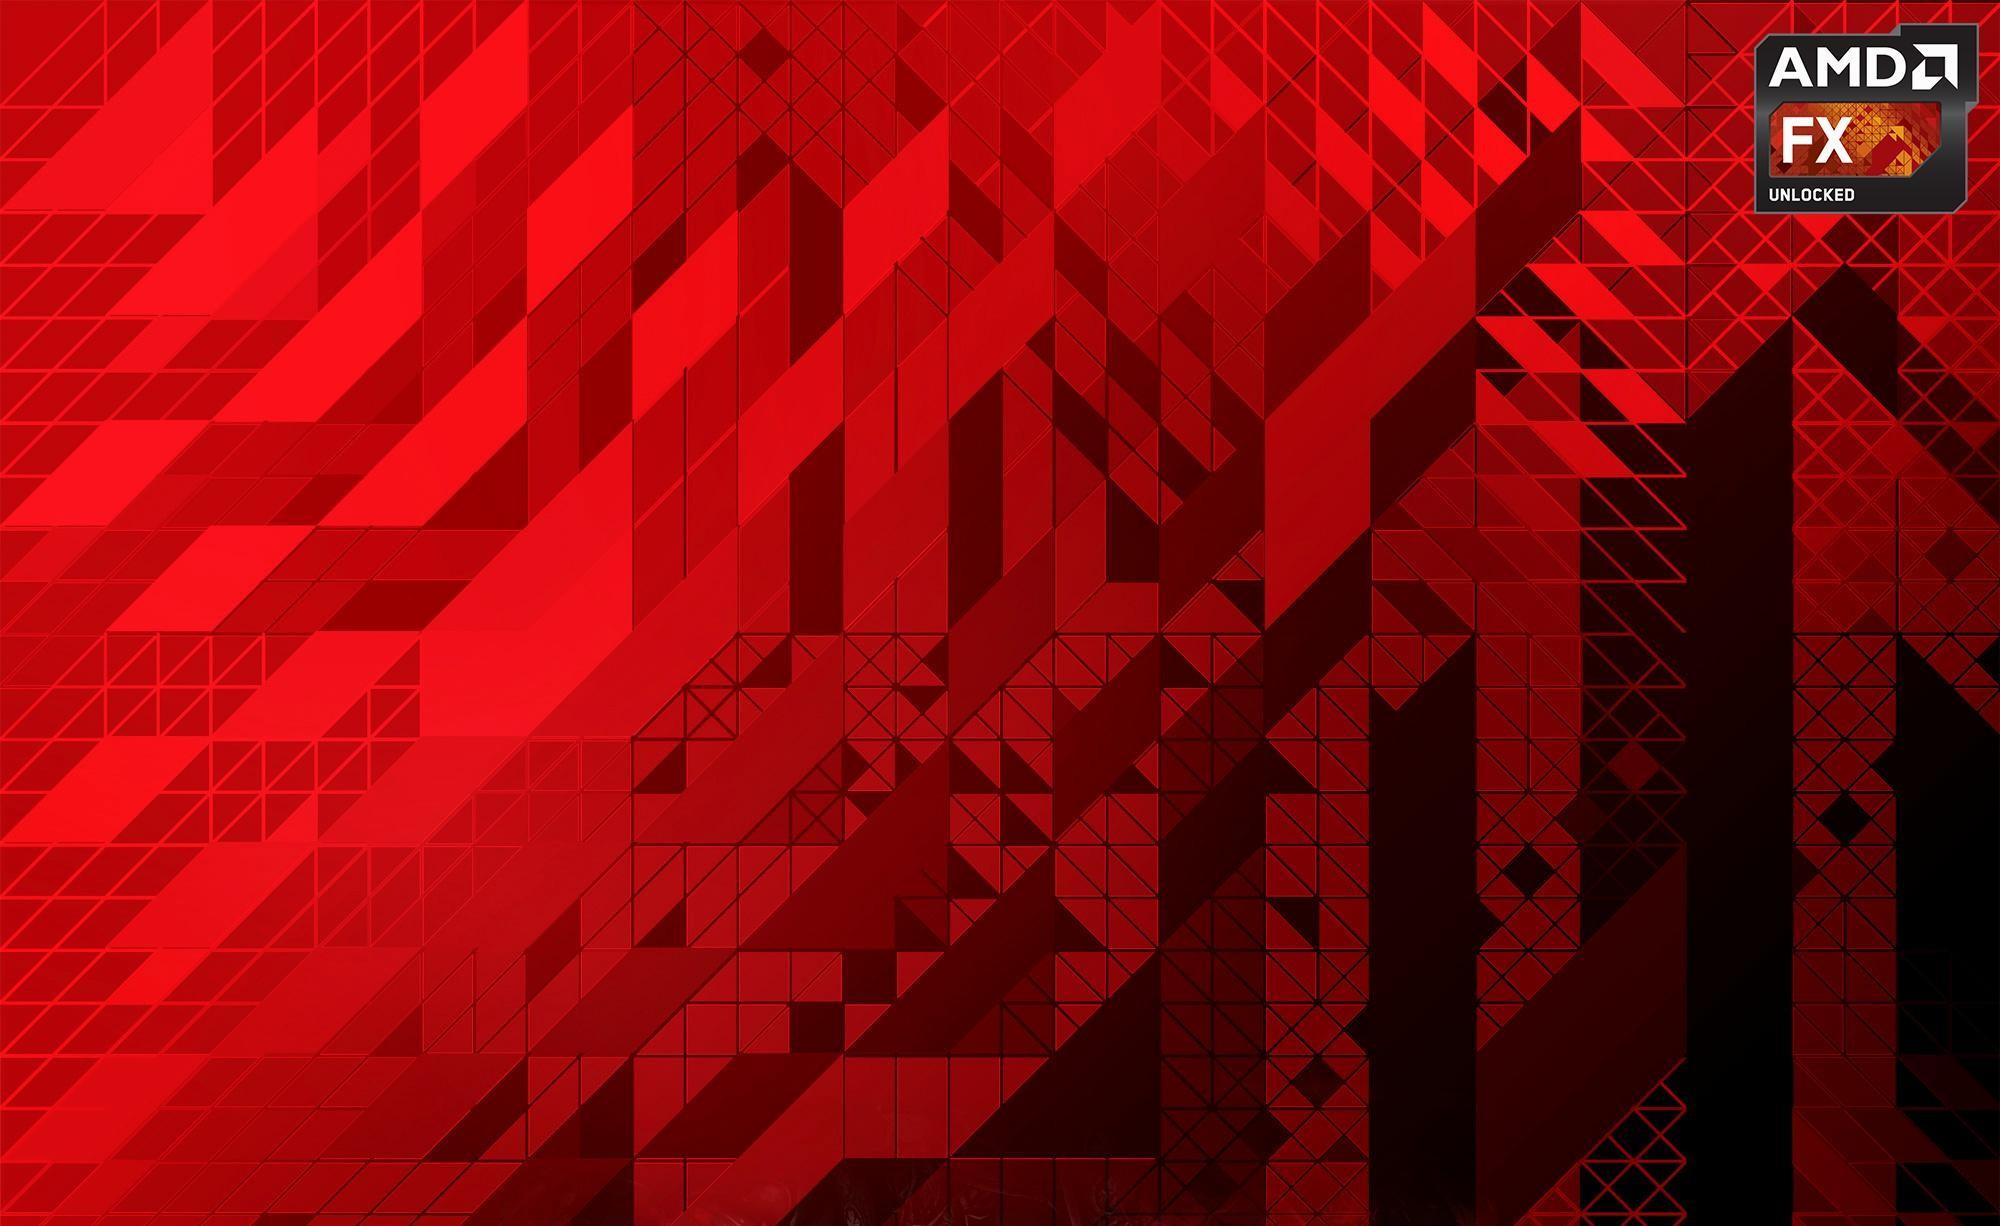 wallpaper.wiki-Amd-Fx-Widescreen-Wallpaper-PIC-WPC0013176